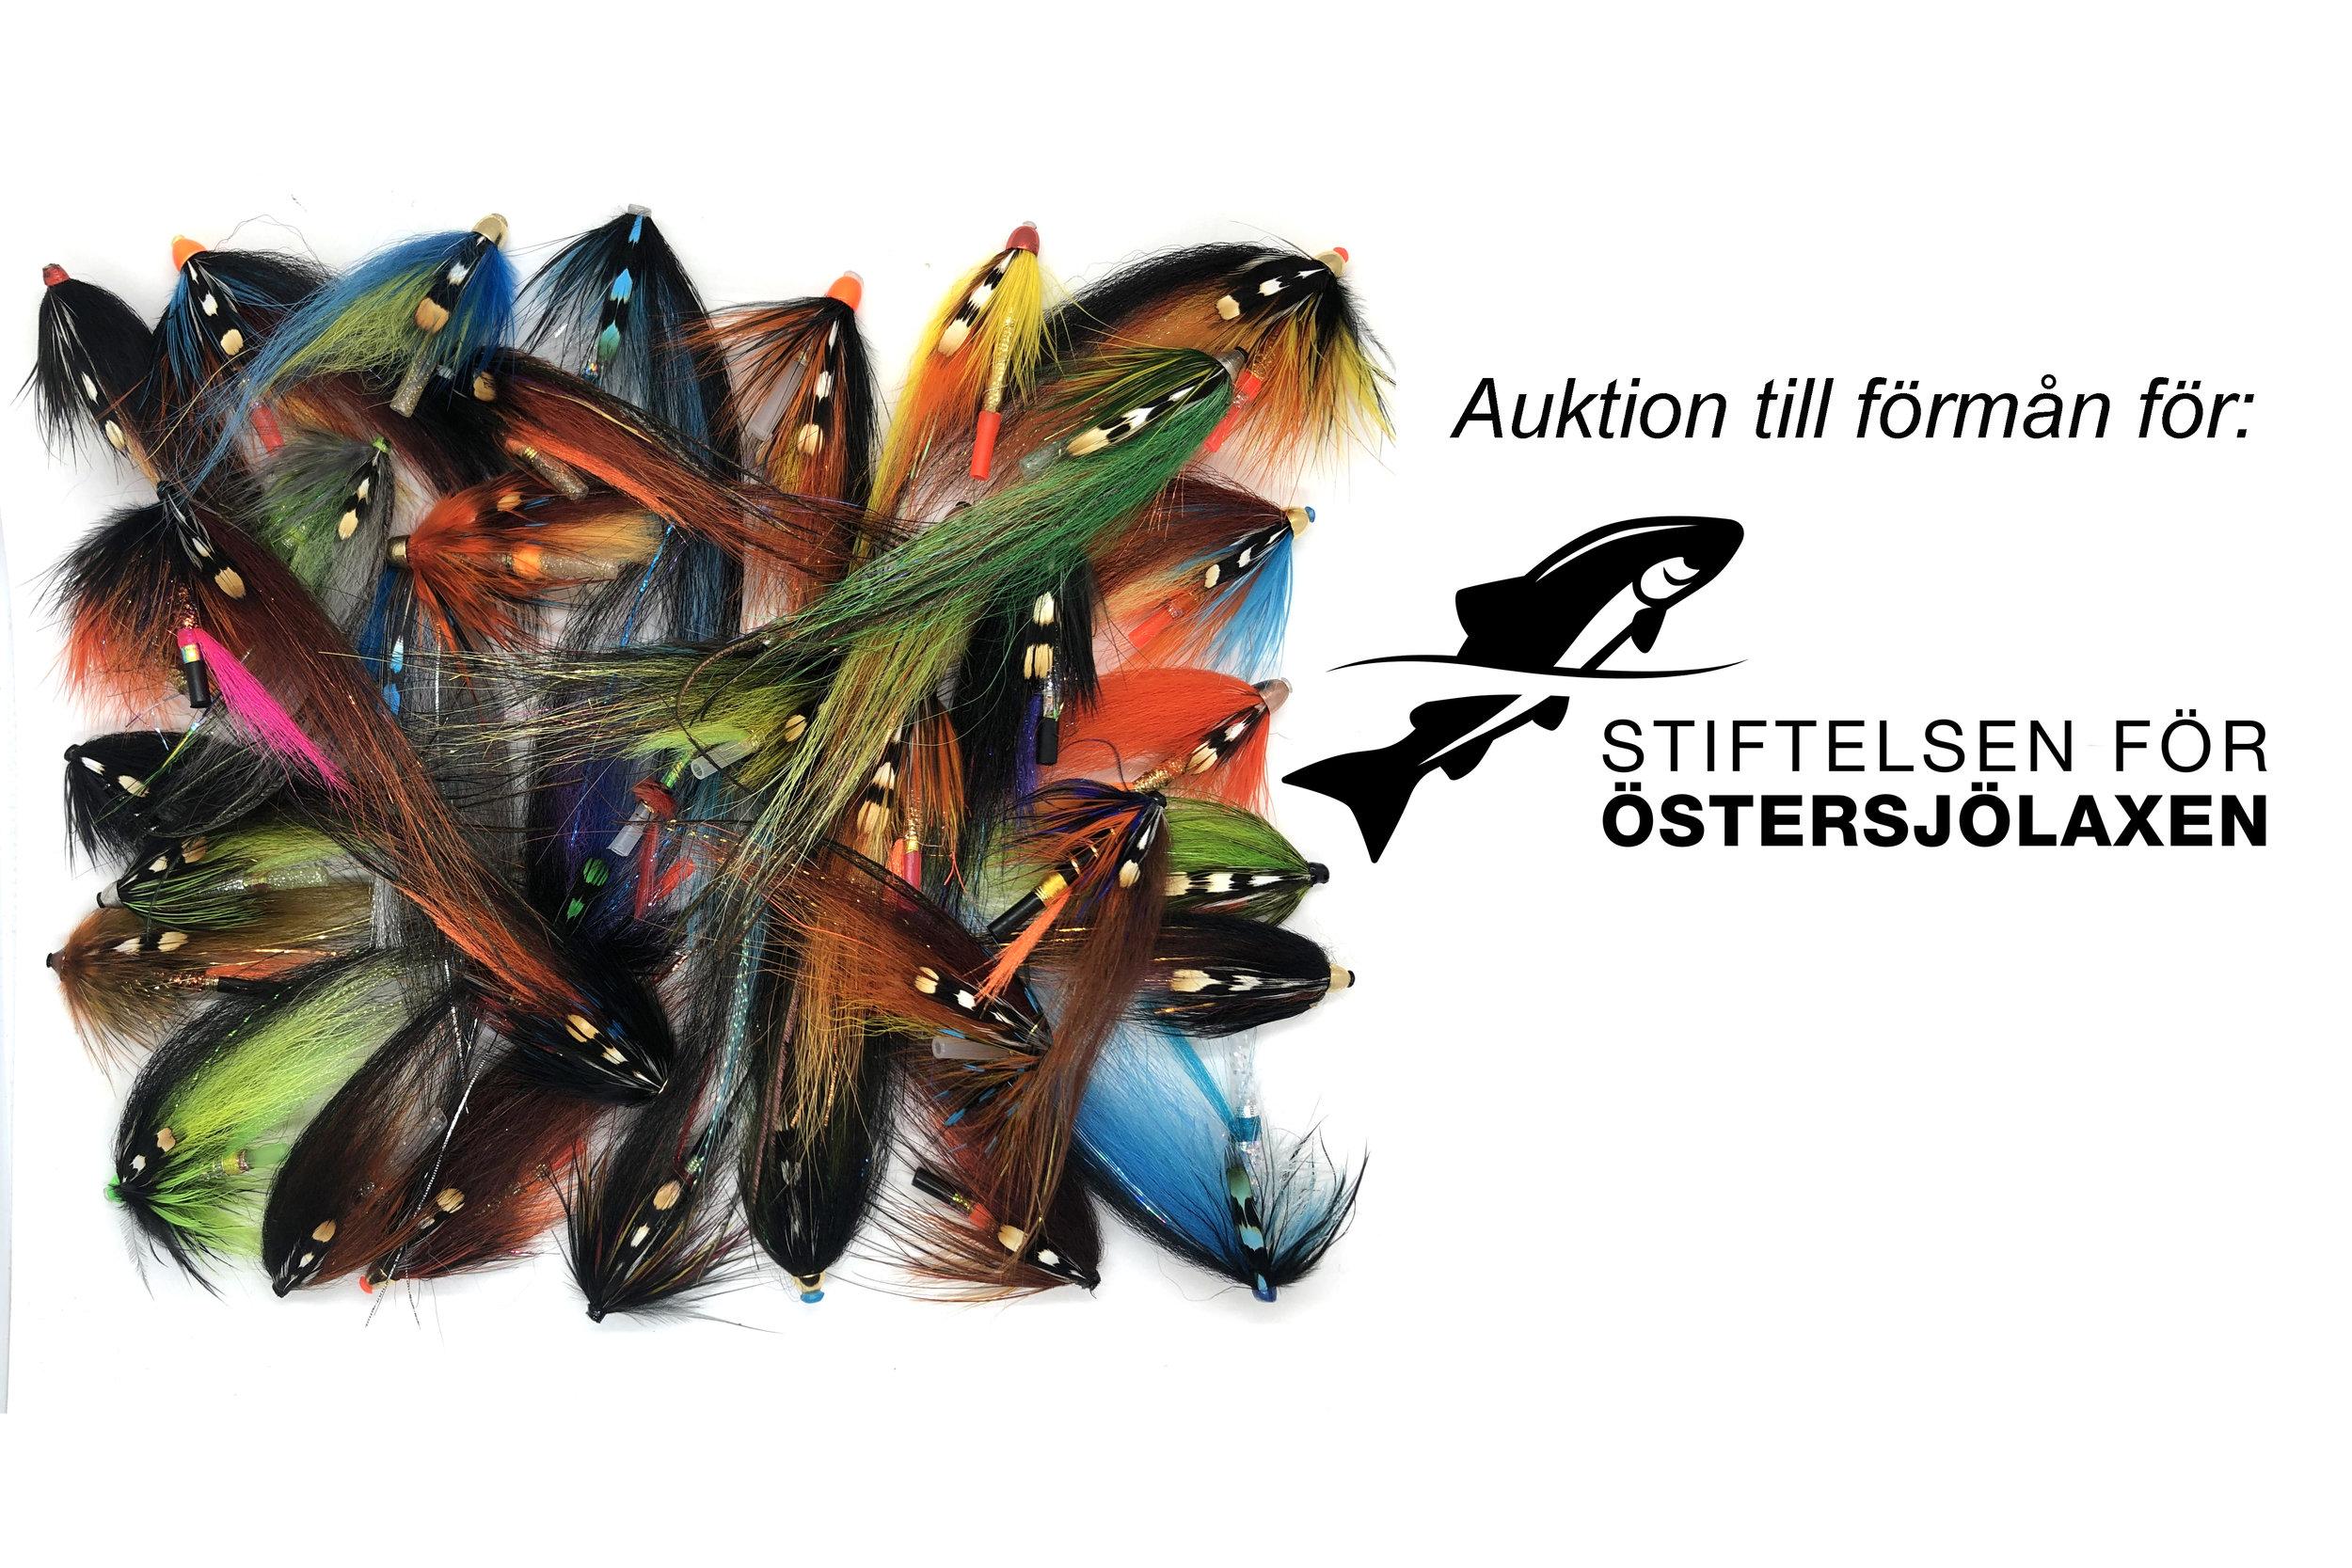 auktion2-41stflugor.jpg